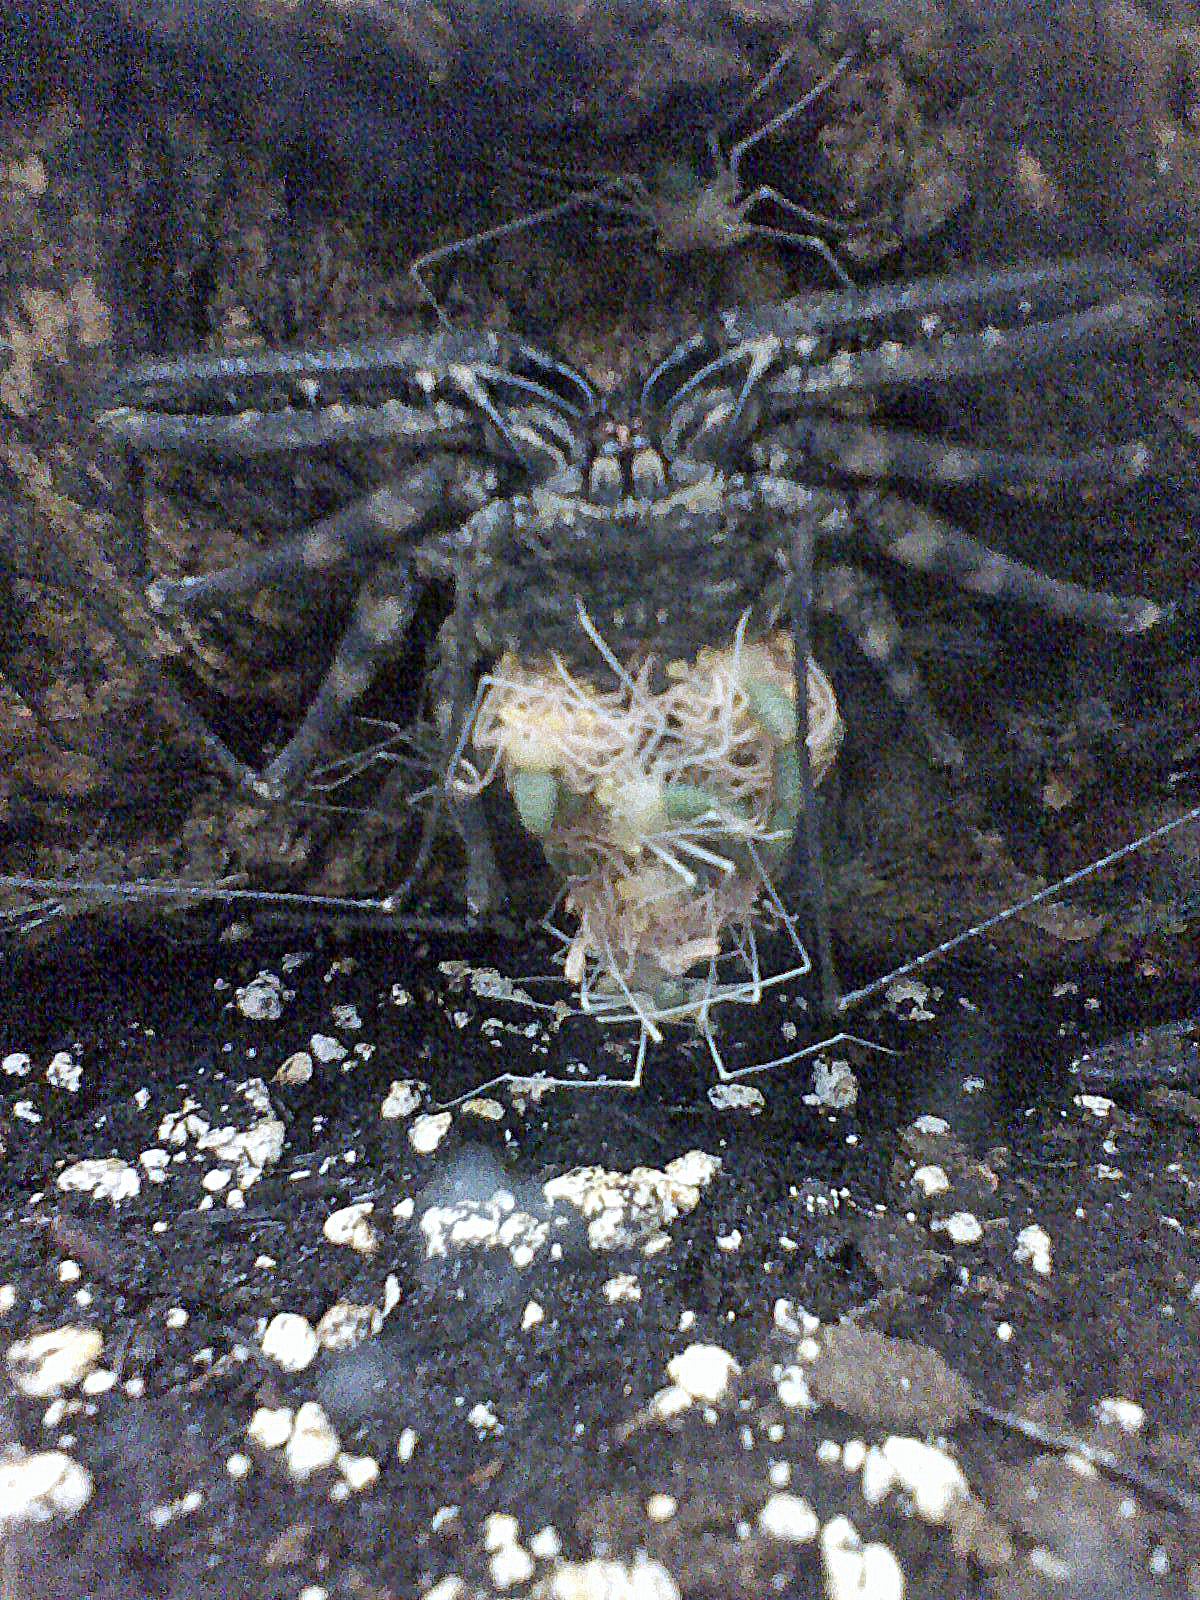 damon diadema, amblypygi, tarantula, spider